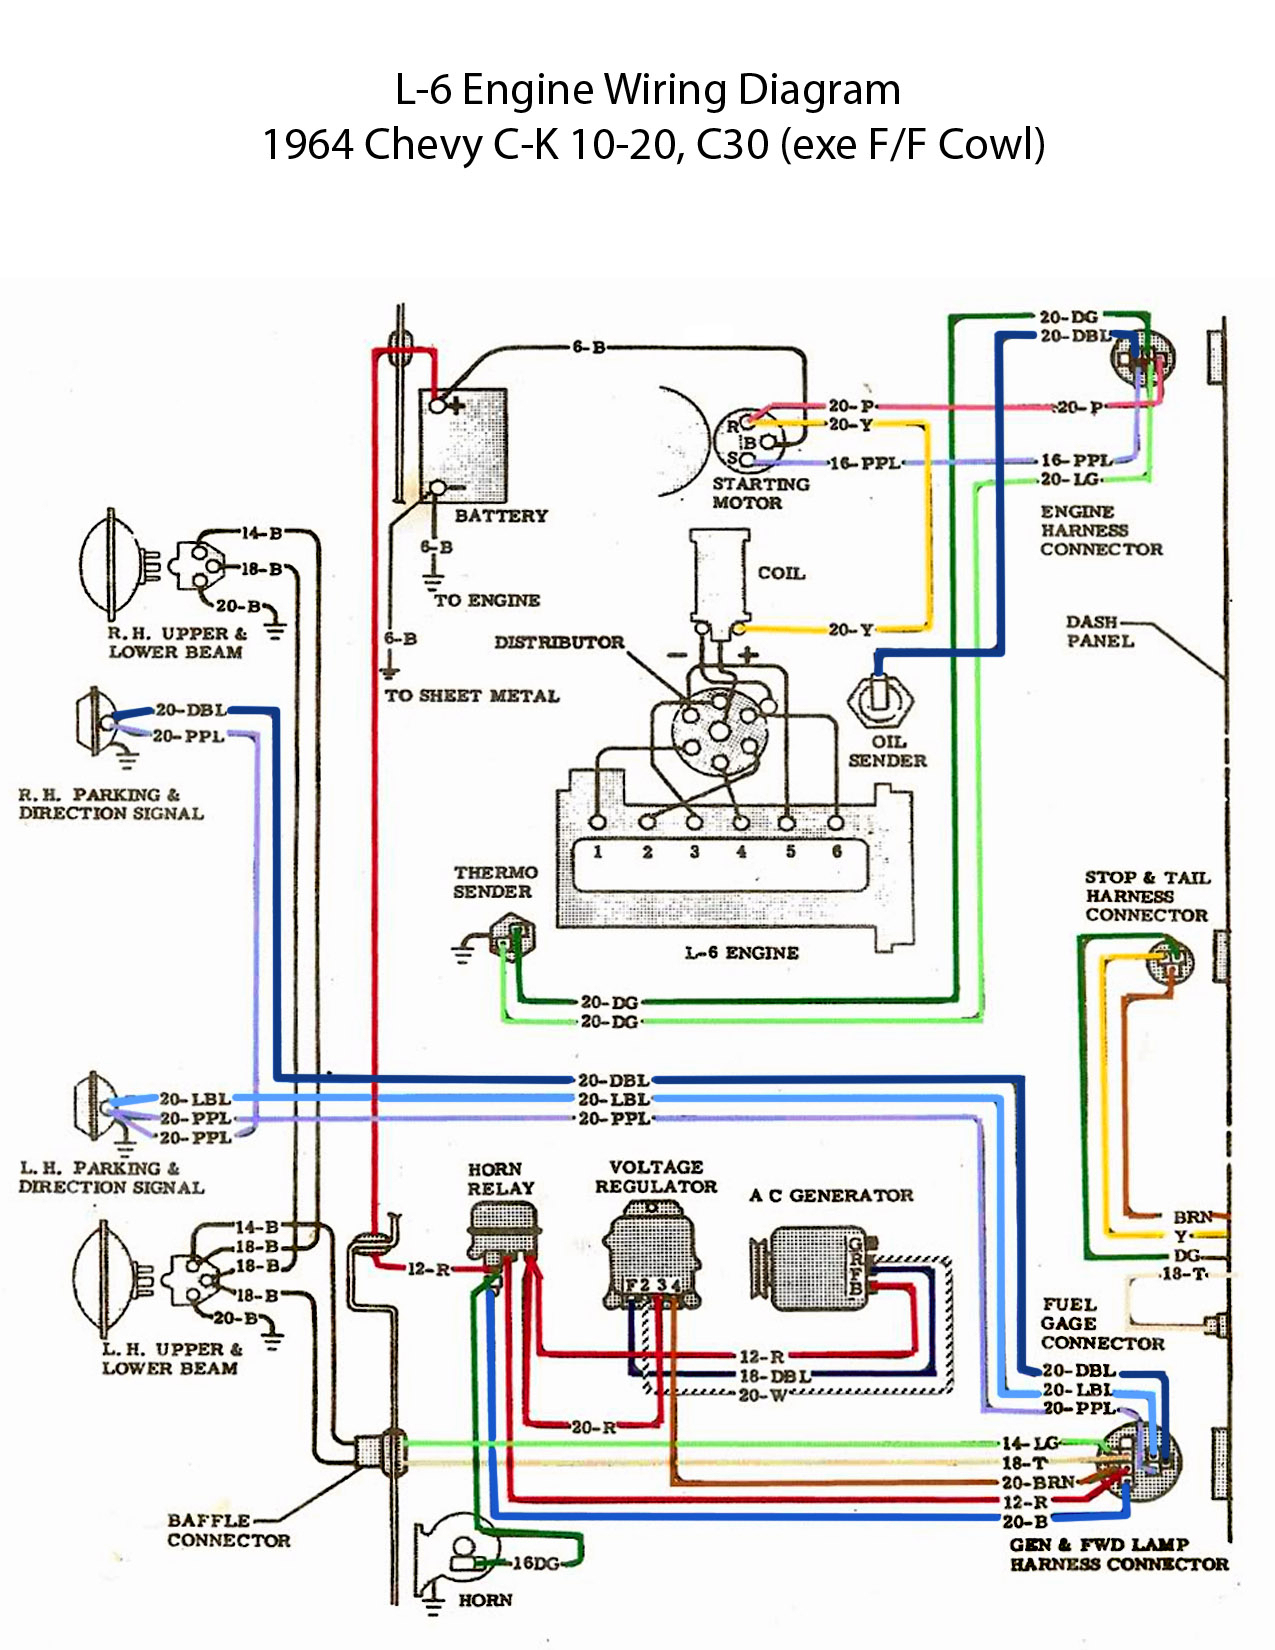 88 Chevy Truck Turn Signal Wiring Diagram | Wiring Diagram - Turn Signal Wiring Diagram Chevy Truck